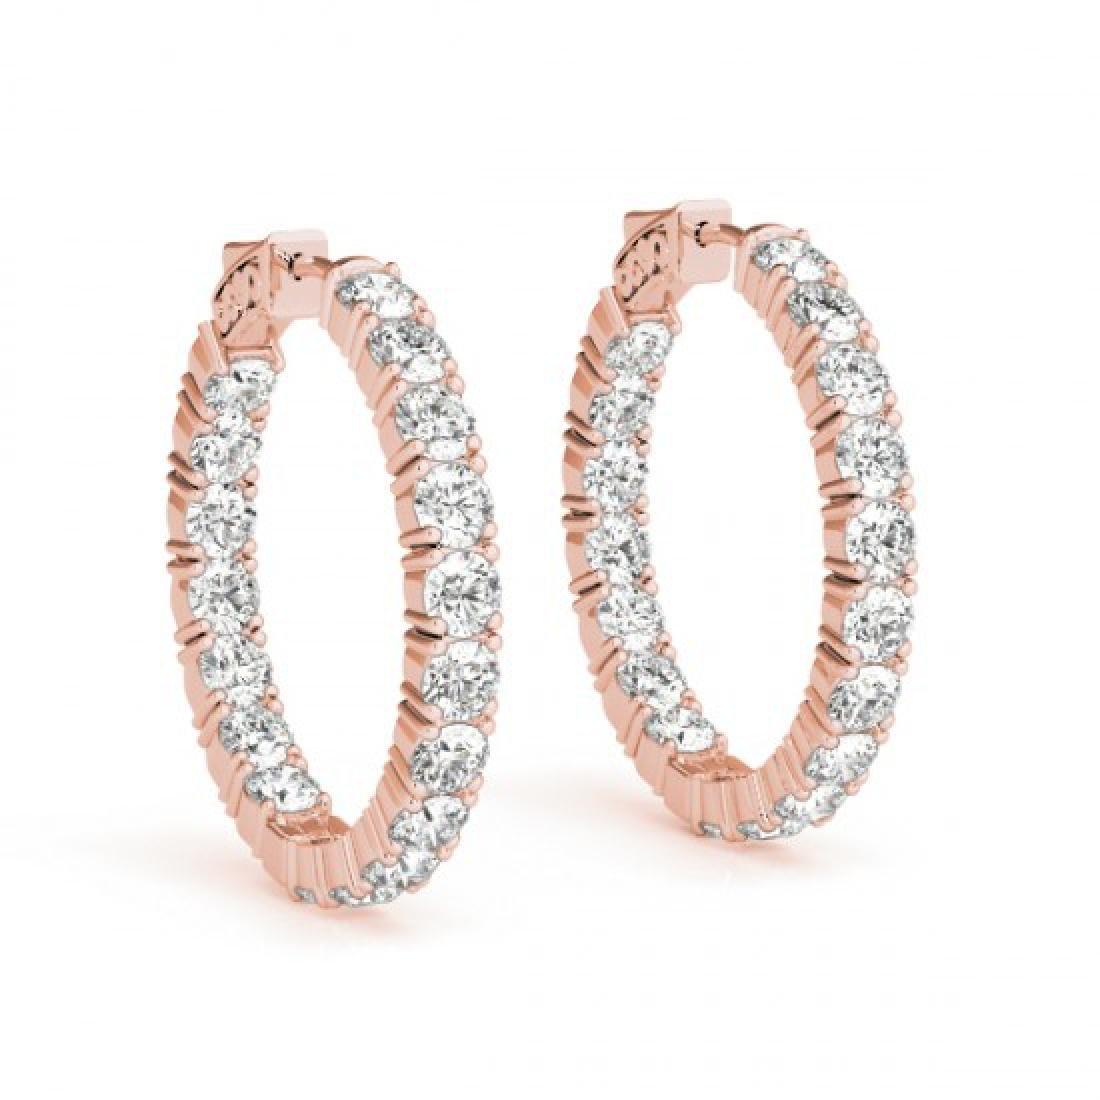 7.5 CTW Diamond VS/SI Certified 37 Mm Hoop Earrings 14K - 2